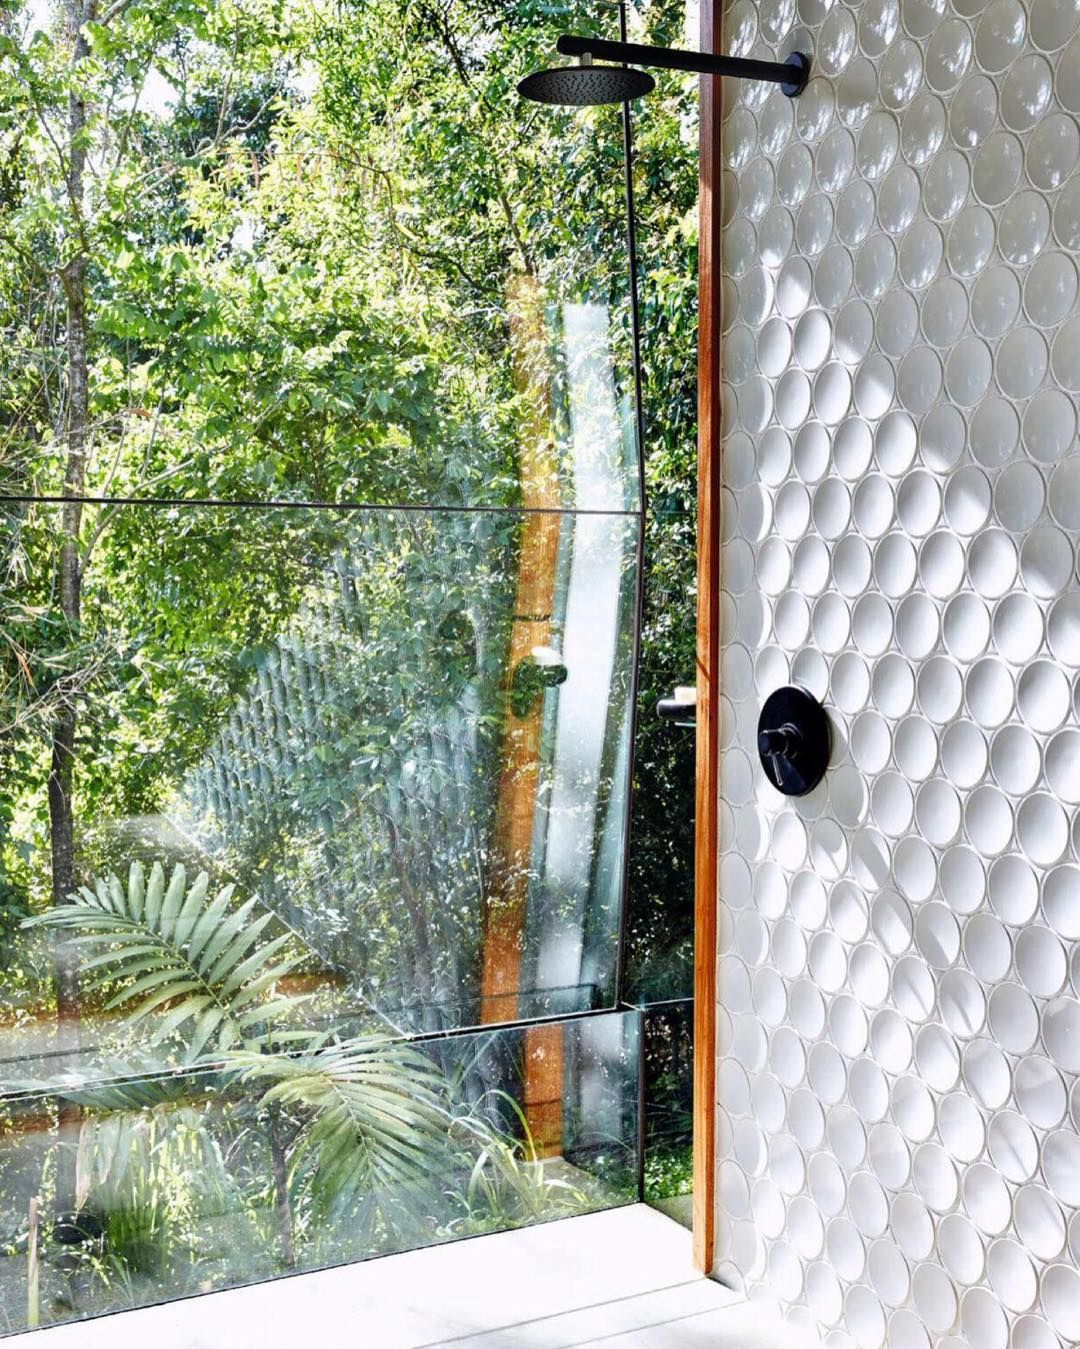 On instagram by idesign14 #homedesign #contratahotel (o) http://ift.tt/1WBMsGD Living | Décor #homedecor  #creative #decor #design #decorgram #decoration #decorinspiration #homestyle #homeliving #homeaccents #homestaging #homestyling #inspire #interior #instadecor #inspiration #instadesign #inspiredesign #interiordesign #insteriorstyling #style #staging #styling #design #designer #modern #homedecoration #contemporary #modernliving #modernhome